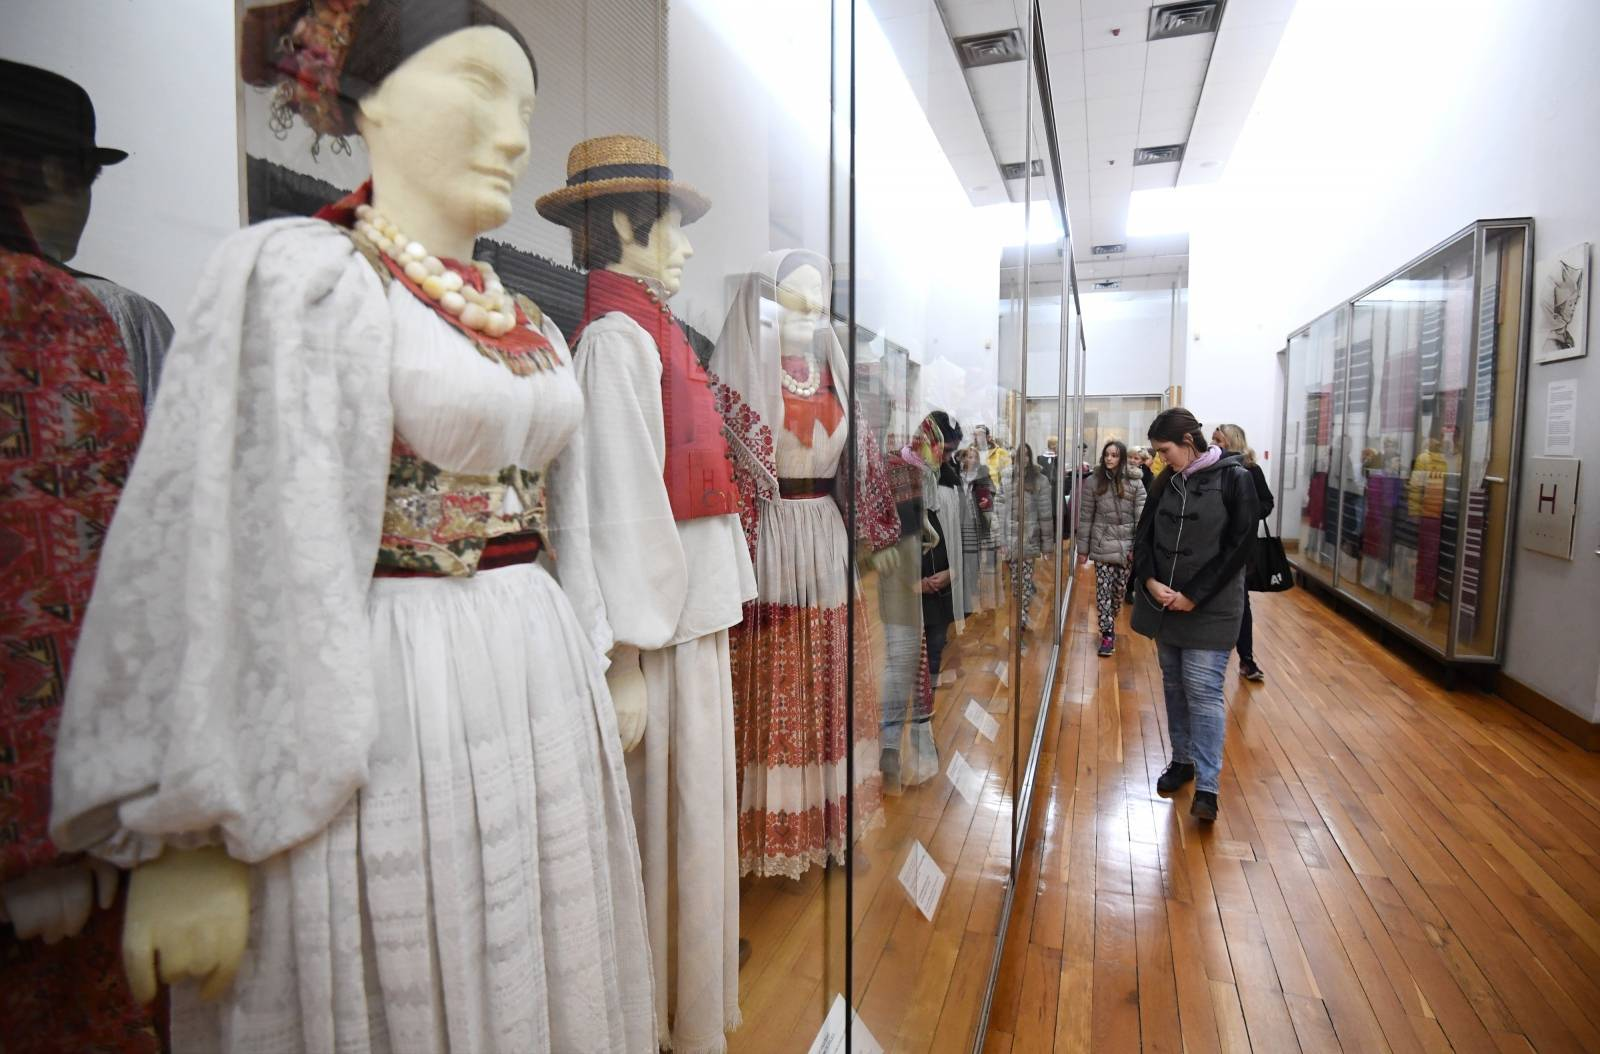 Zagreb: Noć muzeja 2020 u Etnografskom muzeju